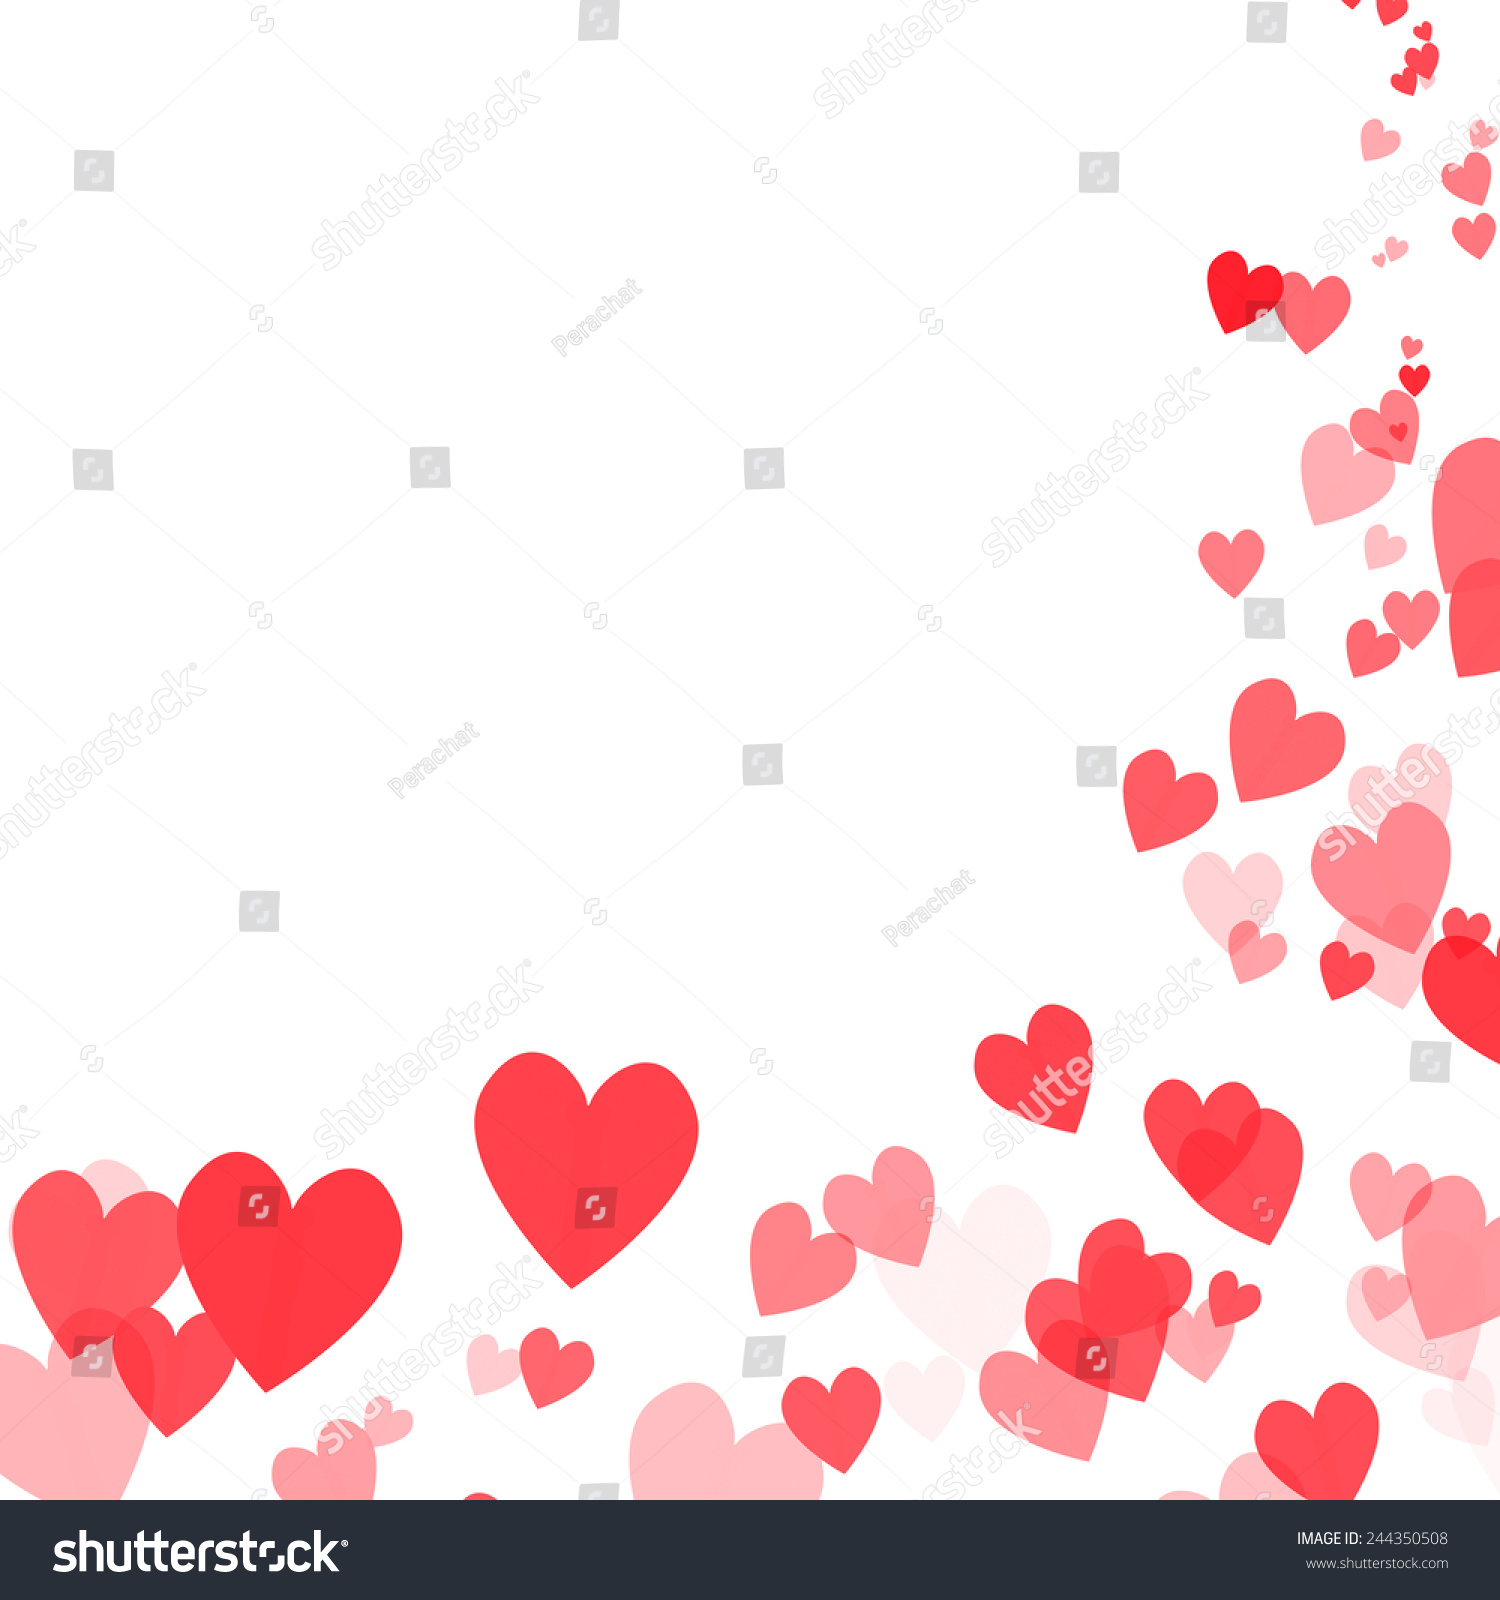 valentines day design hearts background stock illustration